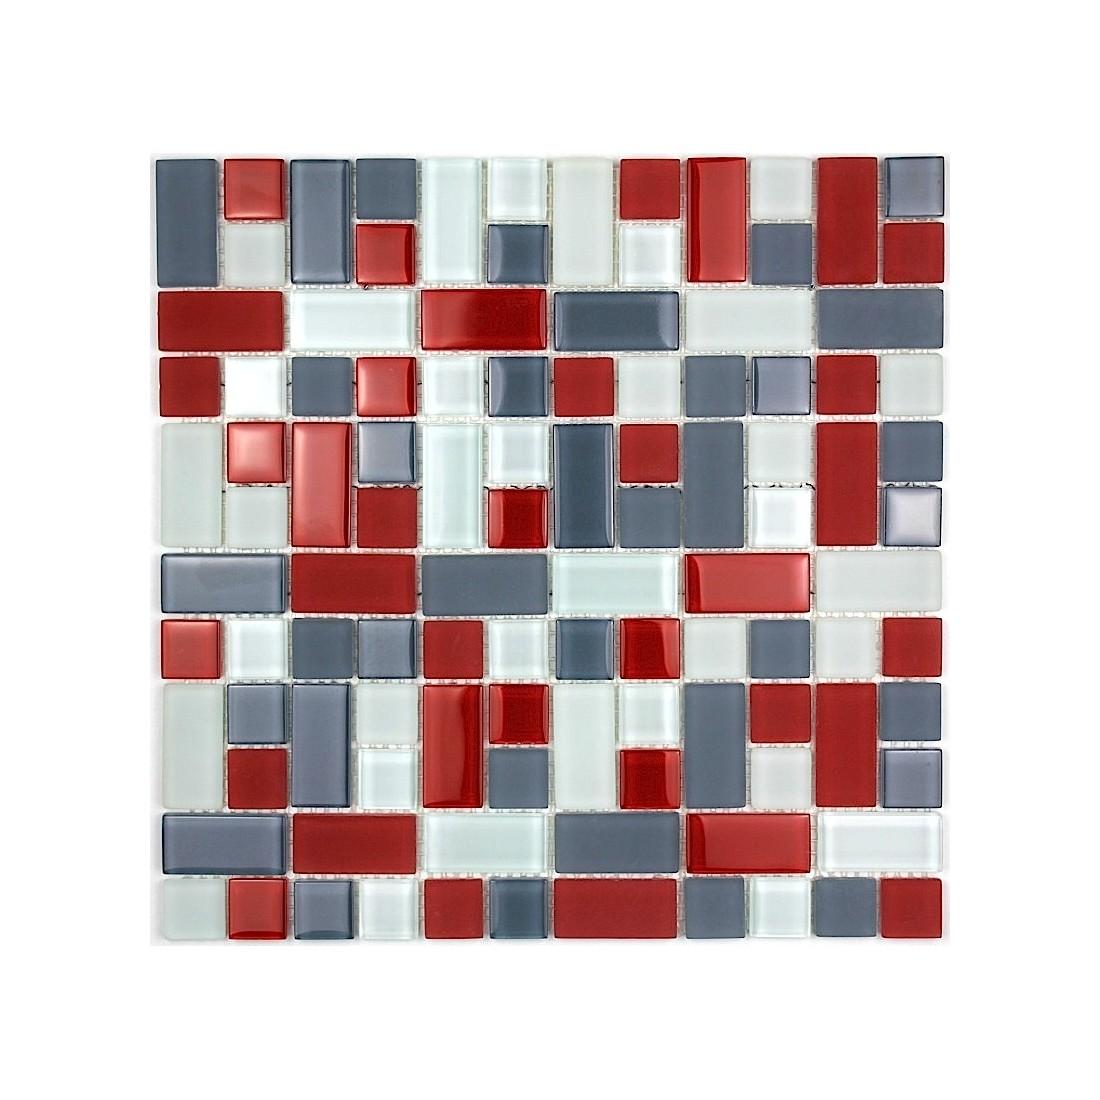 Carrelage - Mosaique de verre autocollante ...